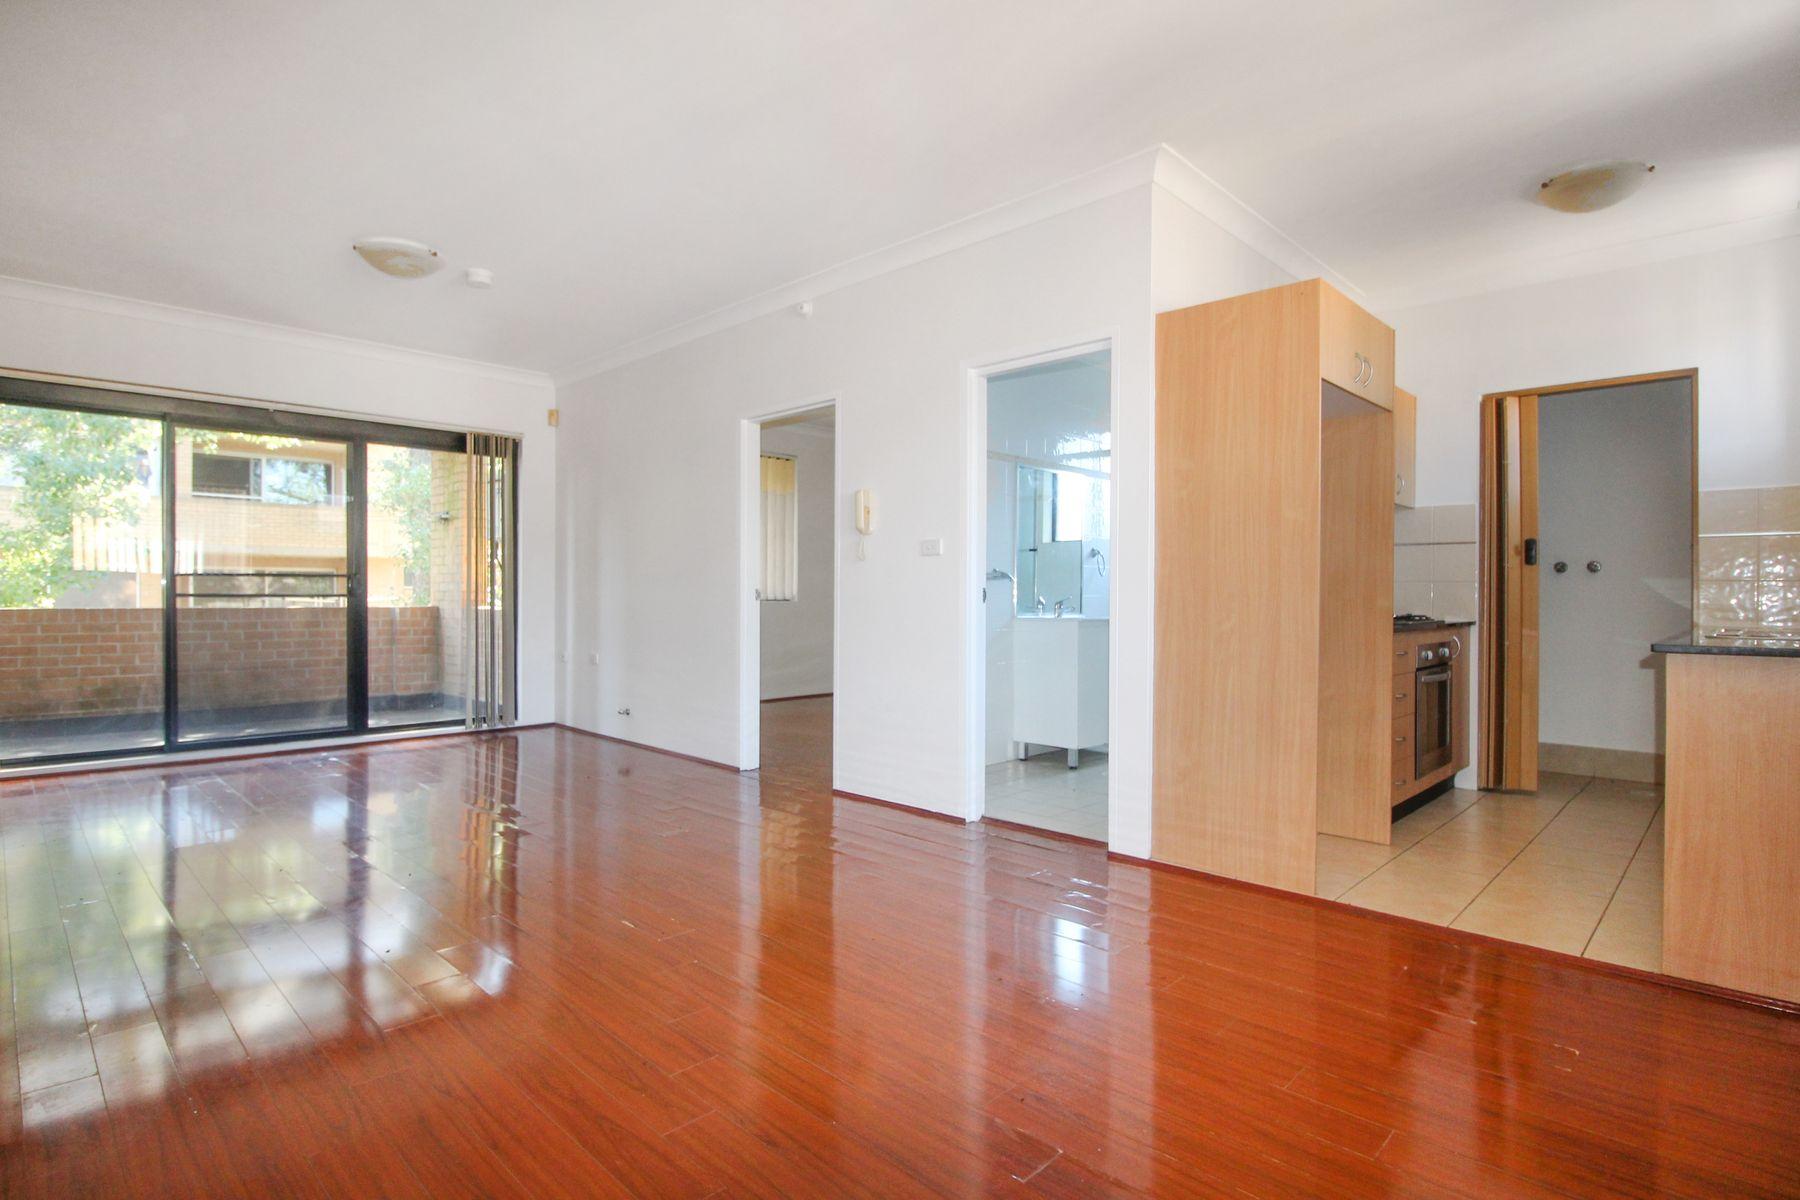 16/43 Bowden Street, Harris Park, NSW 2150